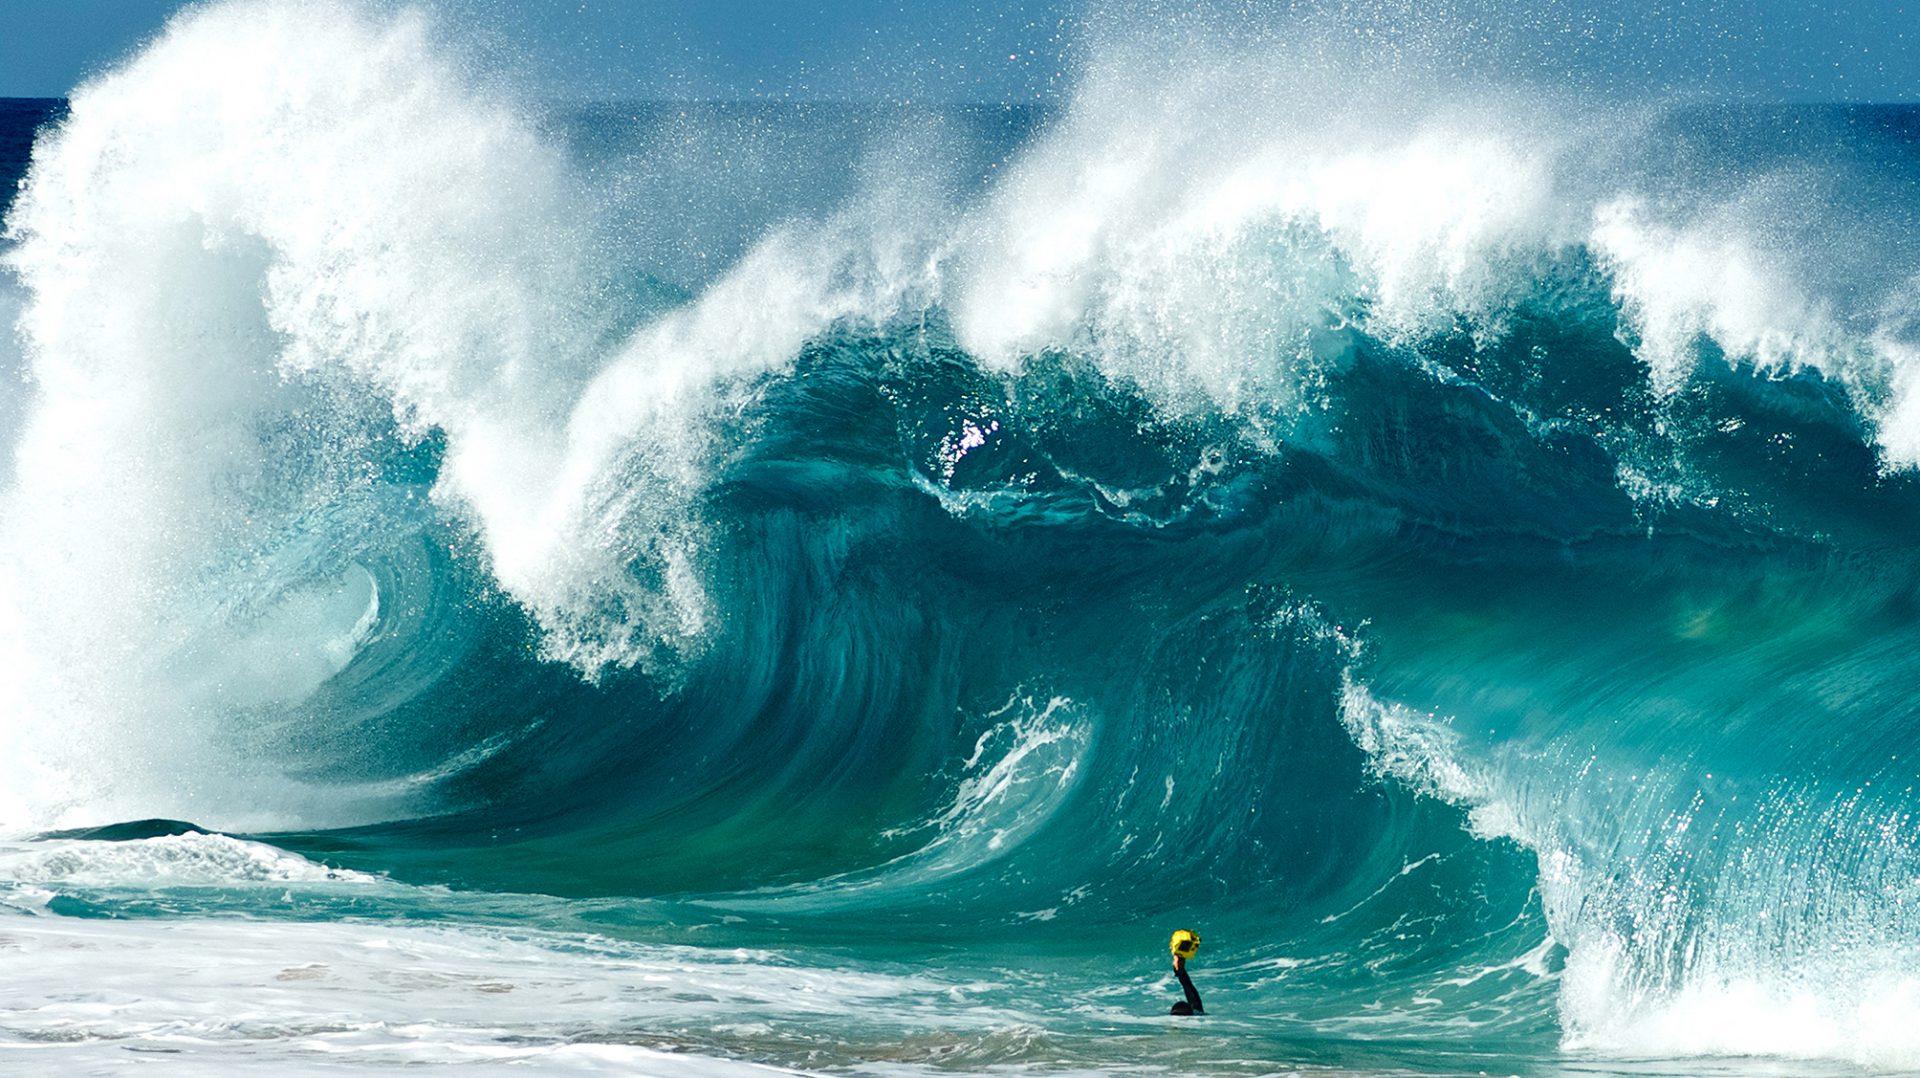 Shorebreak – Die perfekte Welle (Wellenfotograf Clark Little)